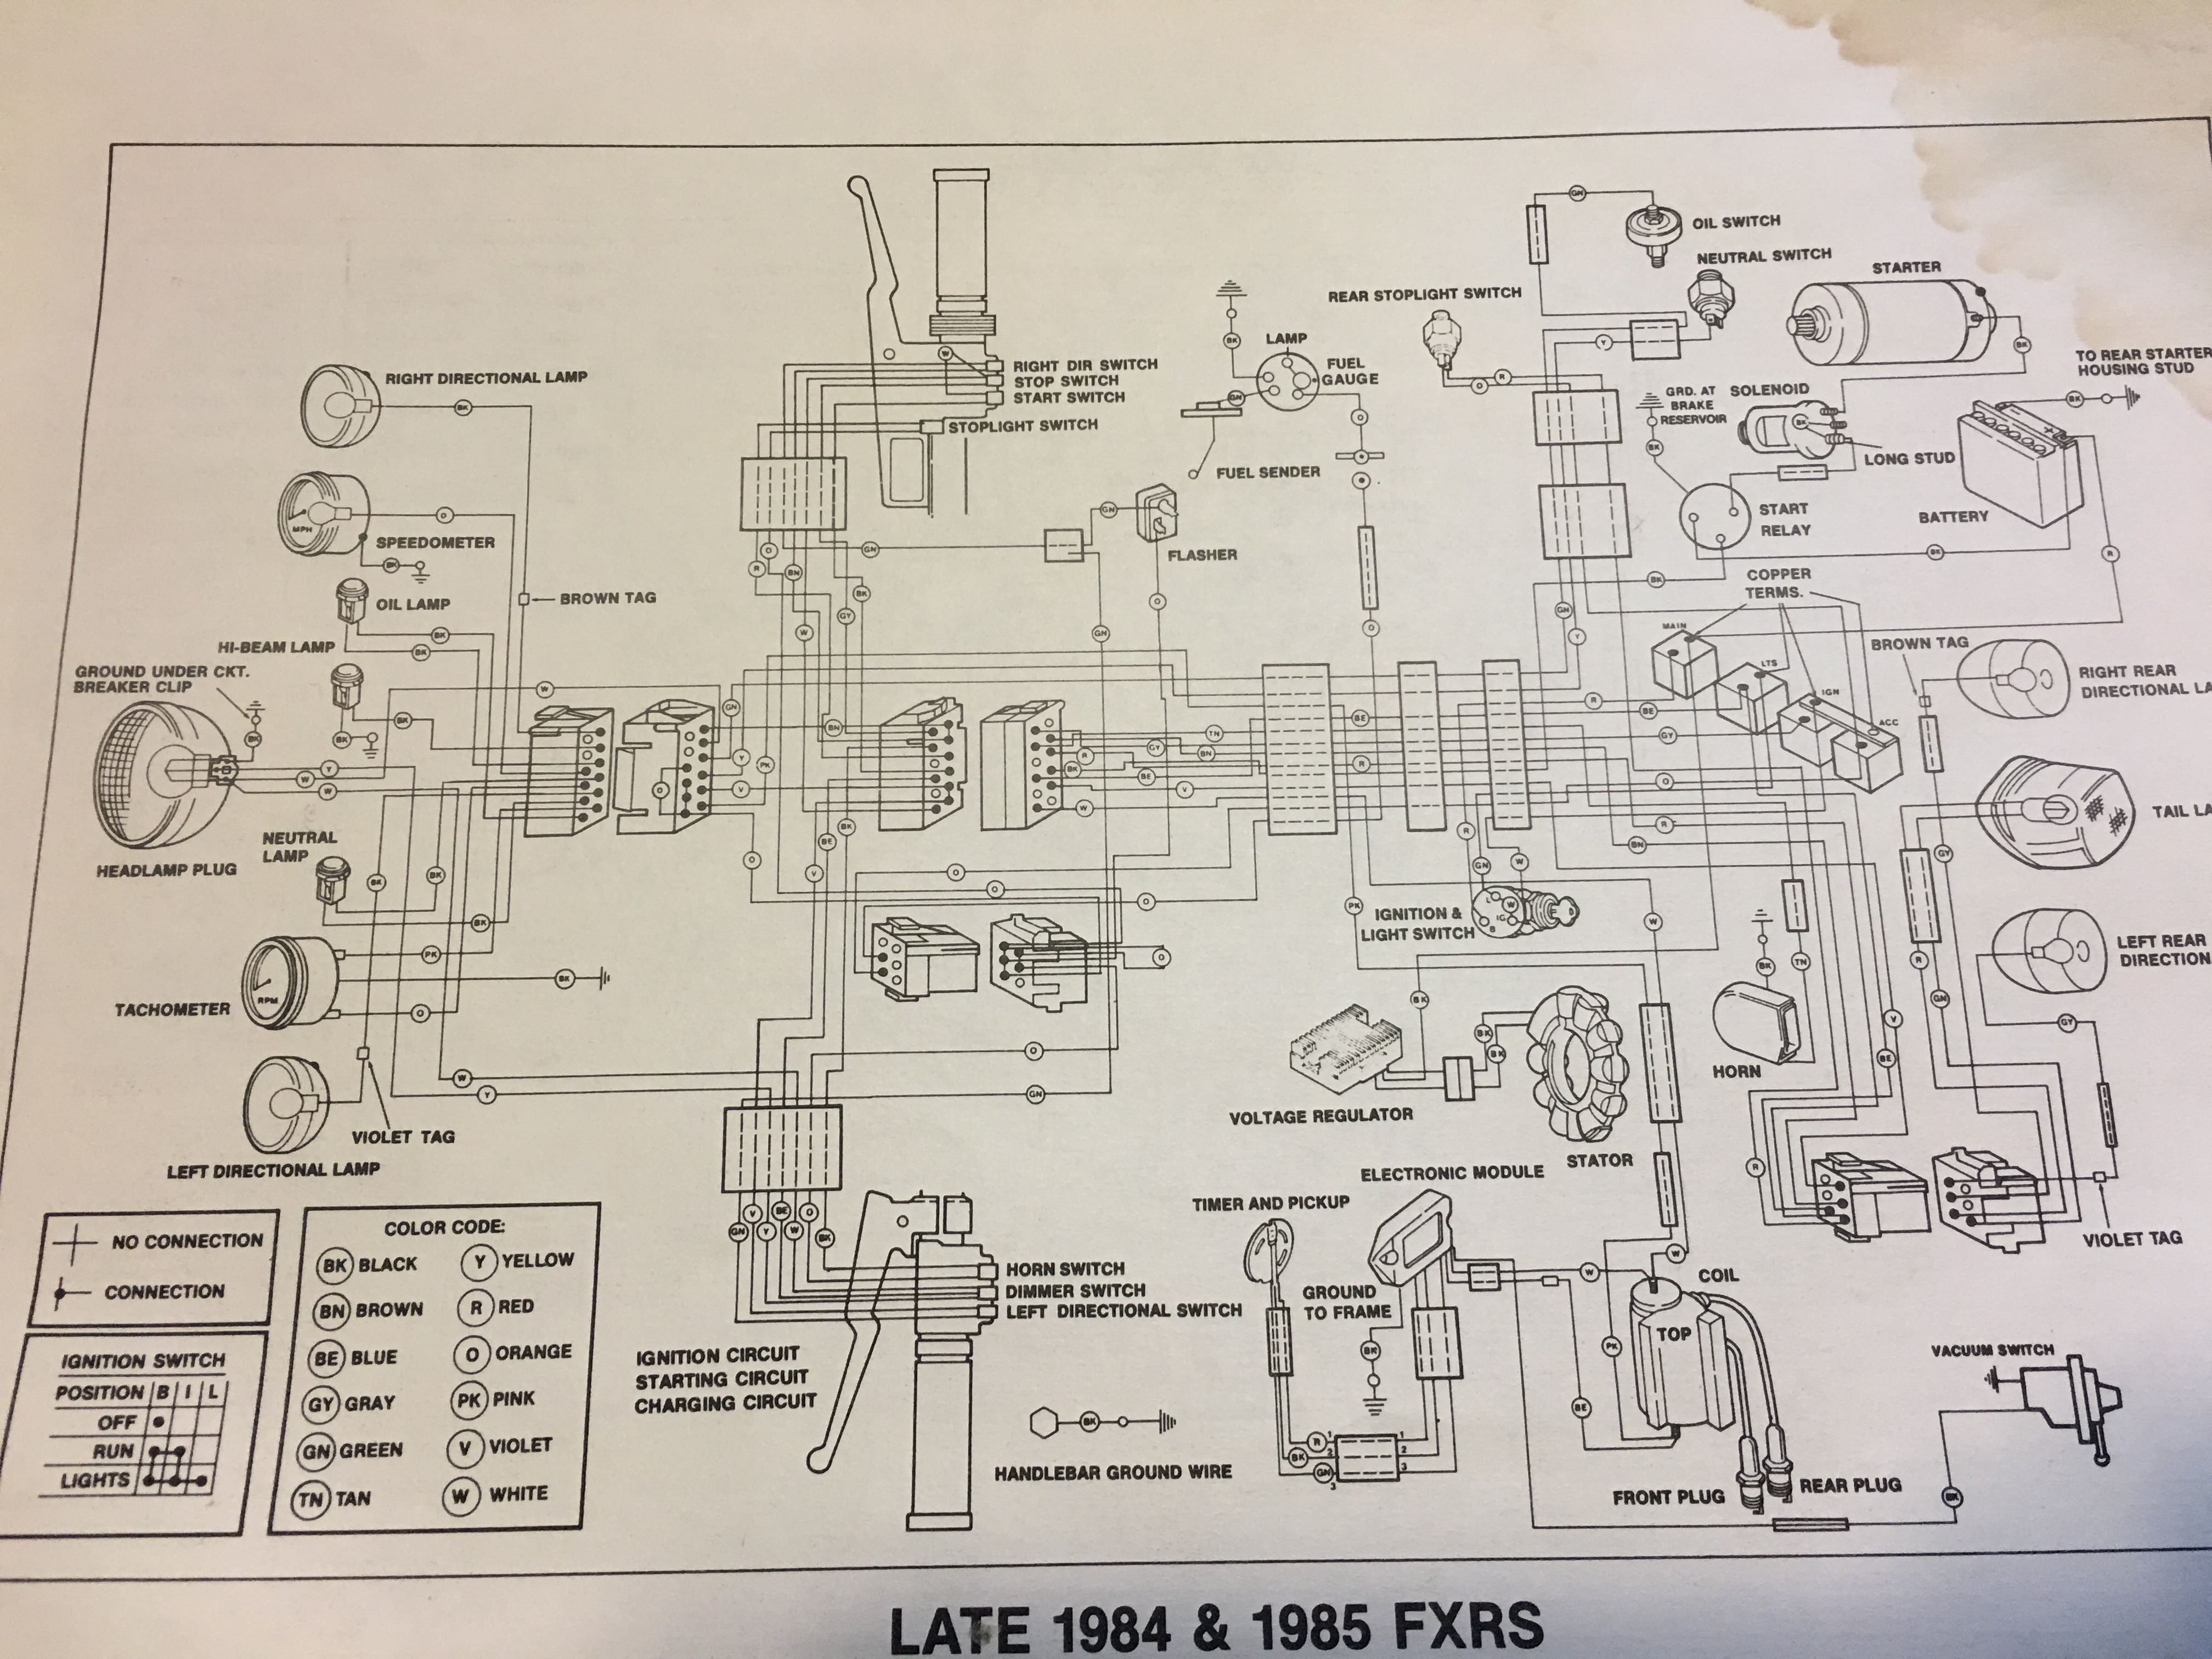 NR_2803] 1985 Harley Davidson Fxr Wiring Diagram Wiring DiagramSimij Icism Cosa Mimig Plan Dness Adit Opein Mohammedshrine Librar Wiring  101